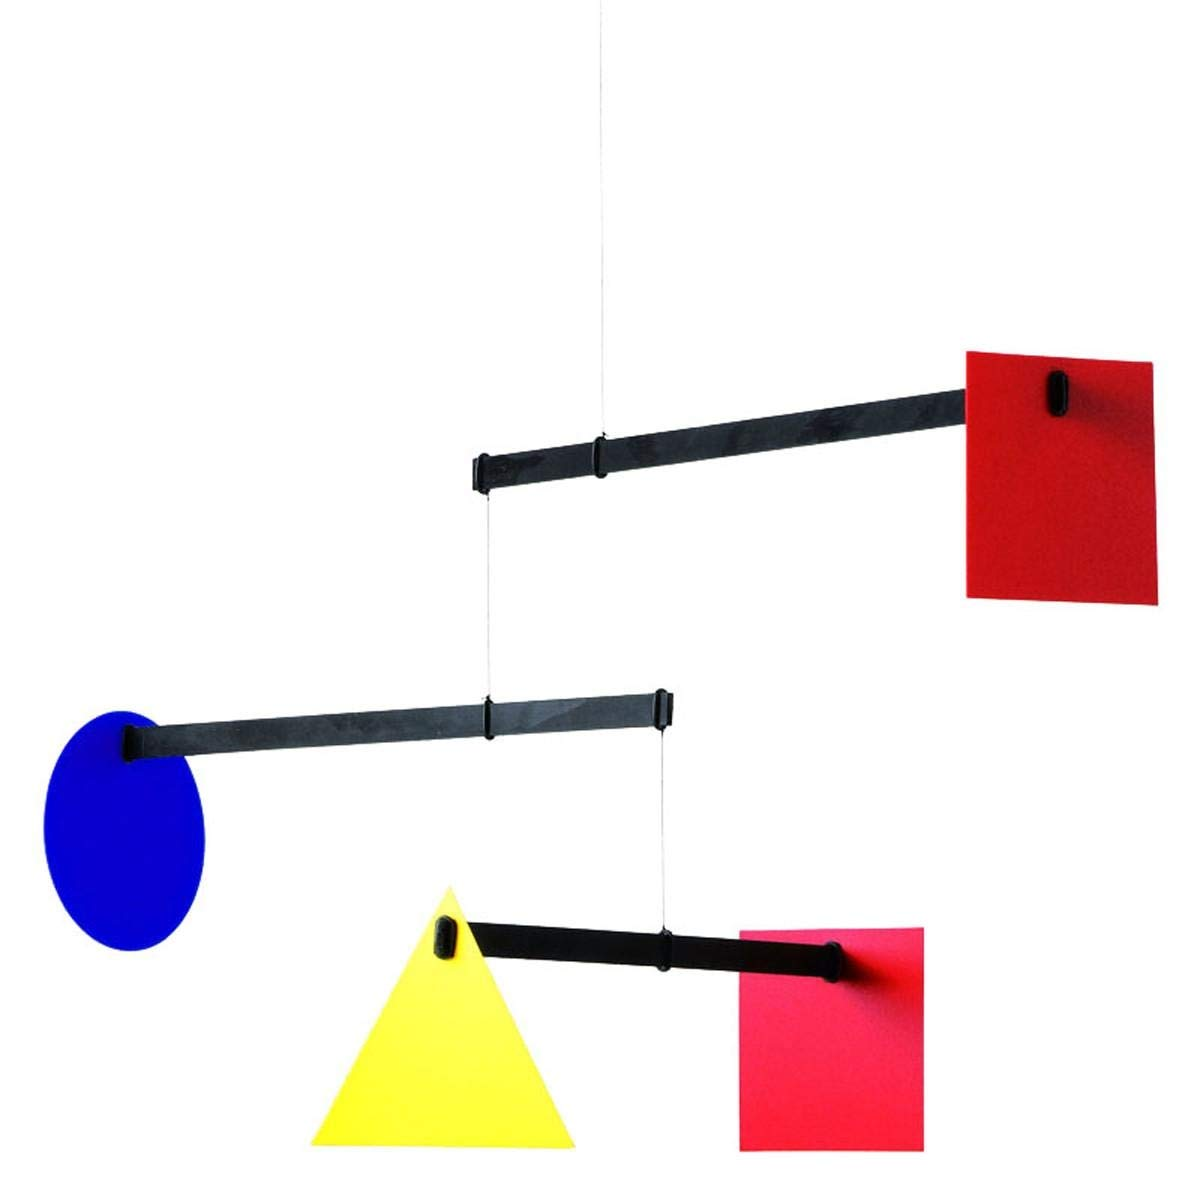 decorative-gifts-for-architect-aficionado-bauhaus-mobile